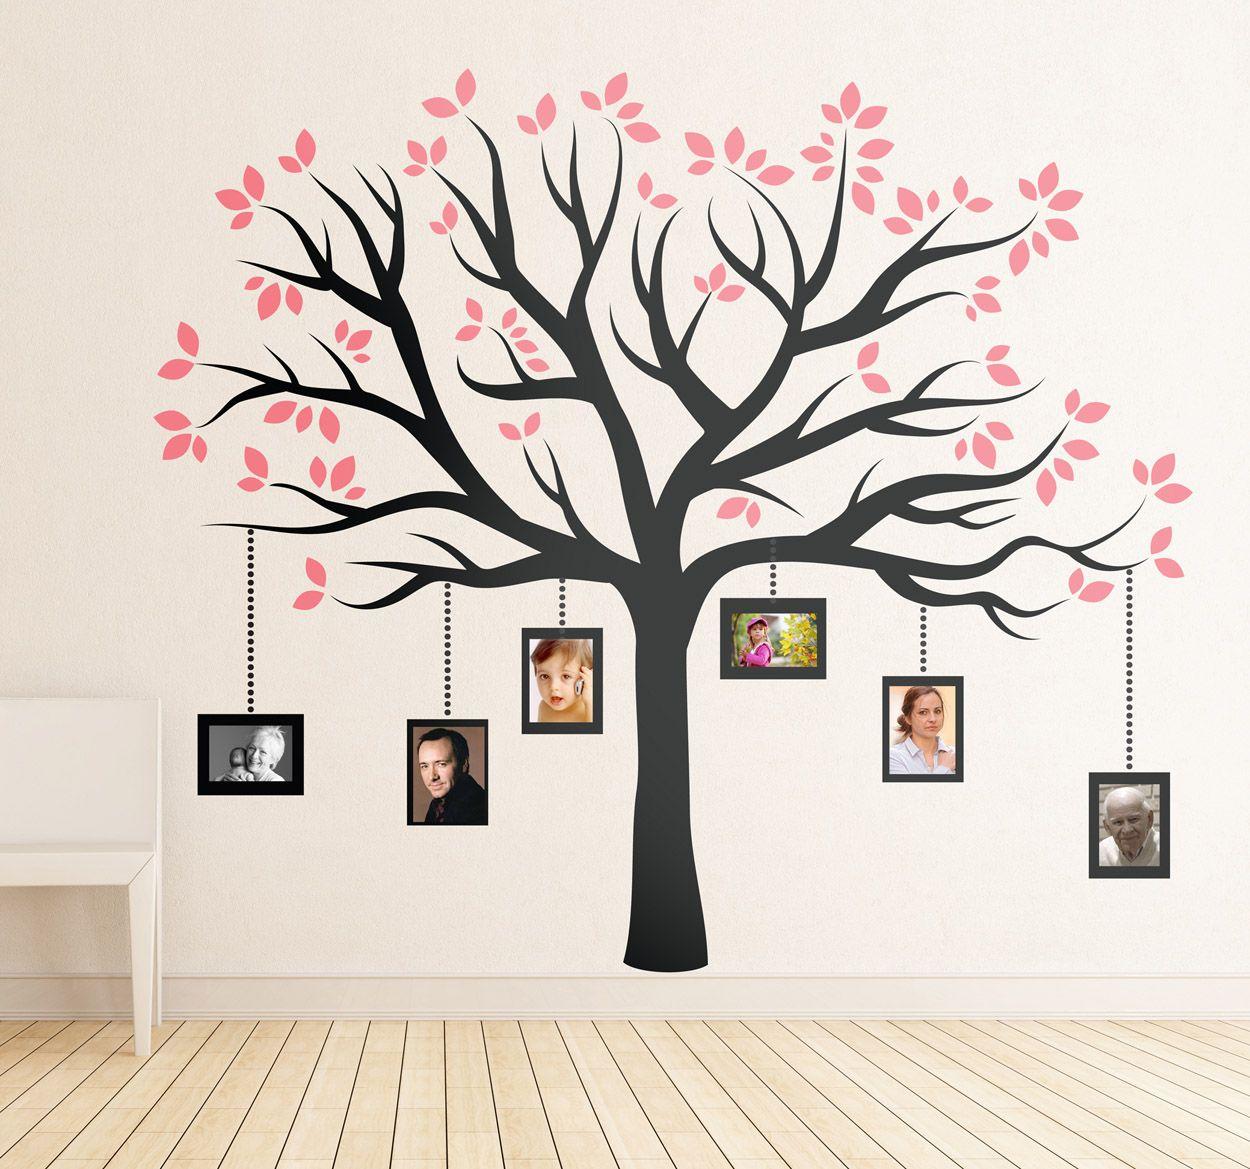 Vinilo decorativo marcos árbol familiar | casa | Pinterest | Árbol ...